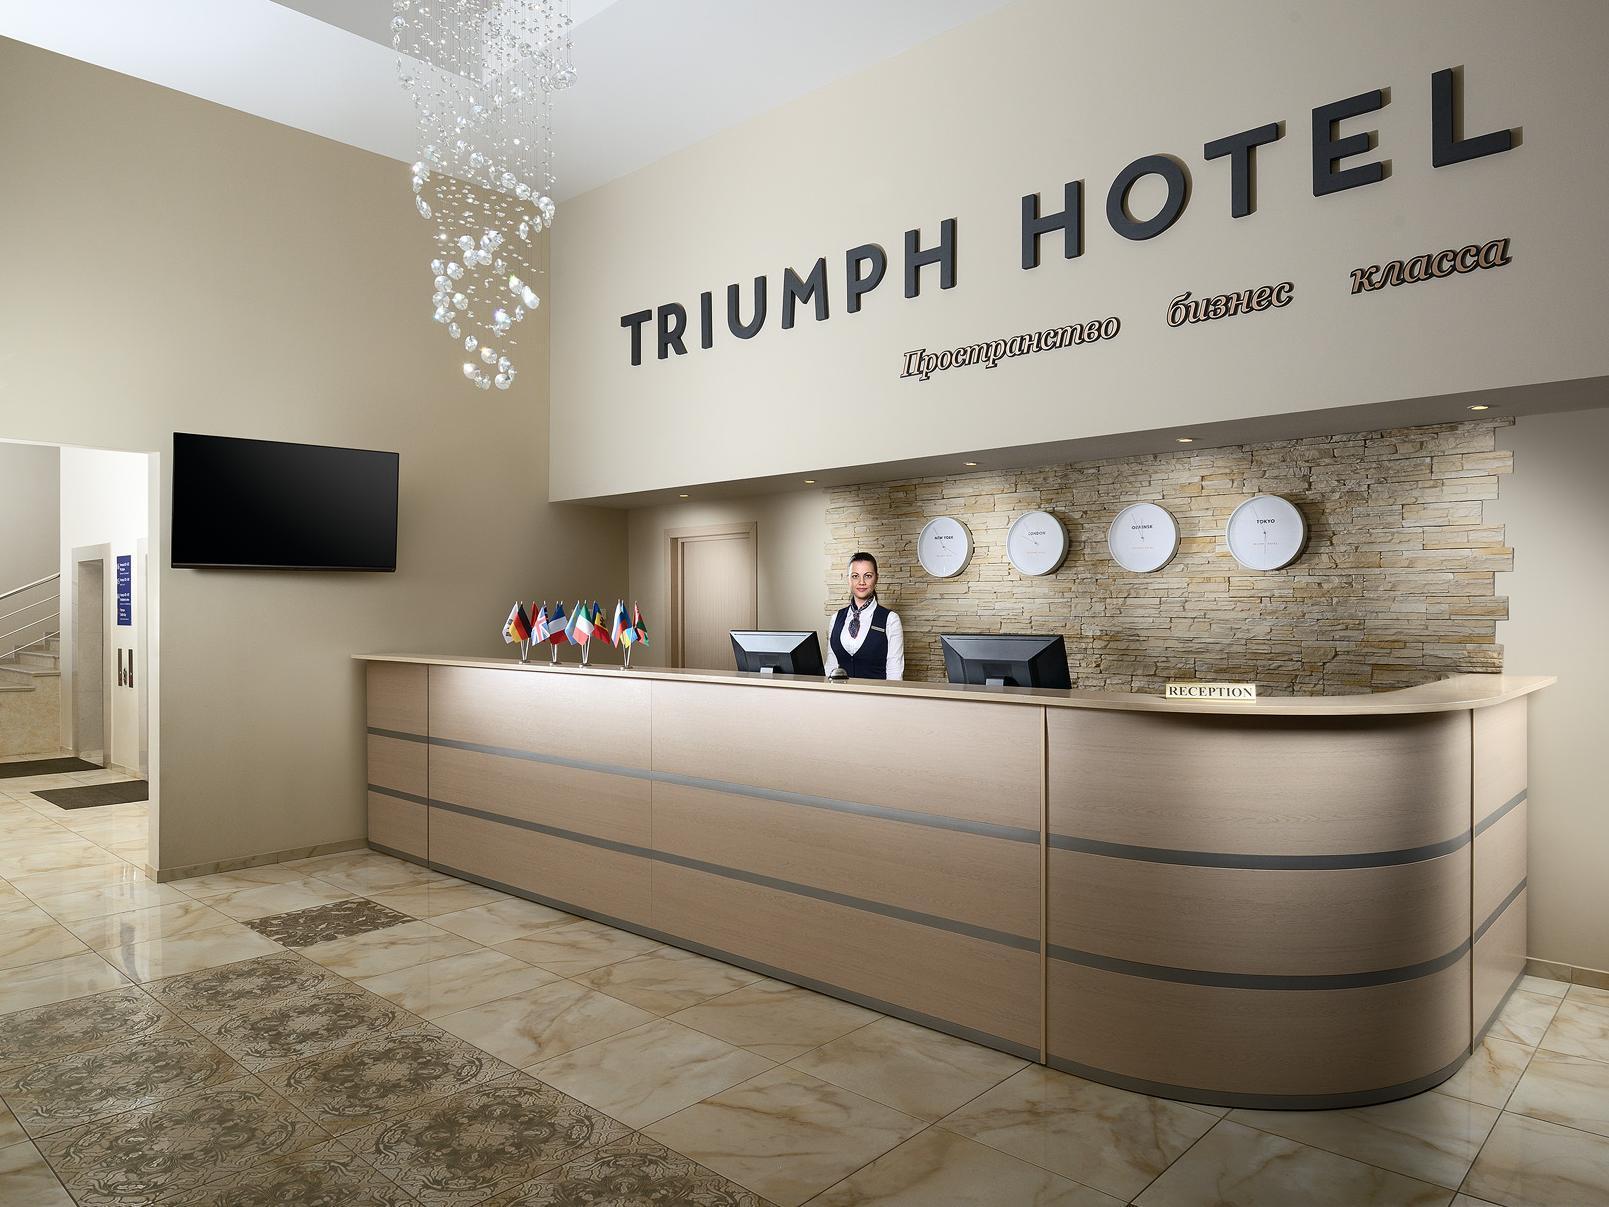 Triumph Hotel Reviews